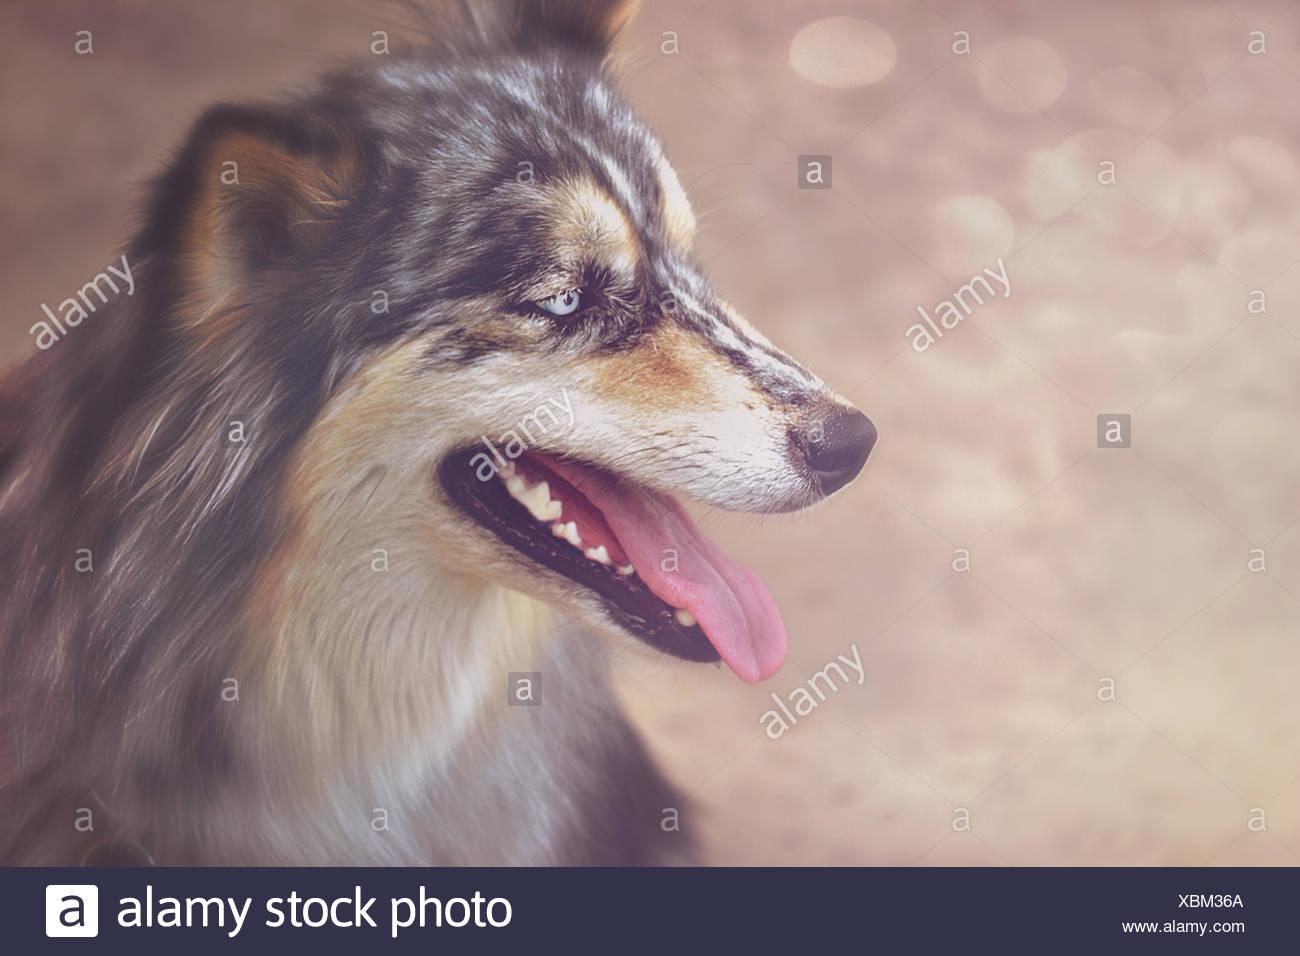 Portrait of panting dog - Stock Image